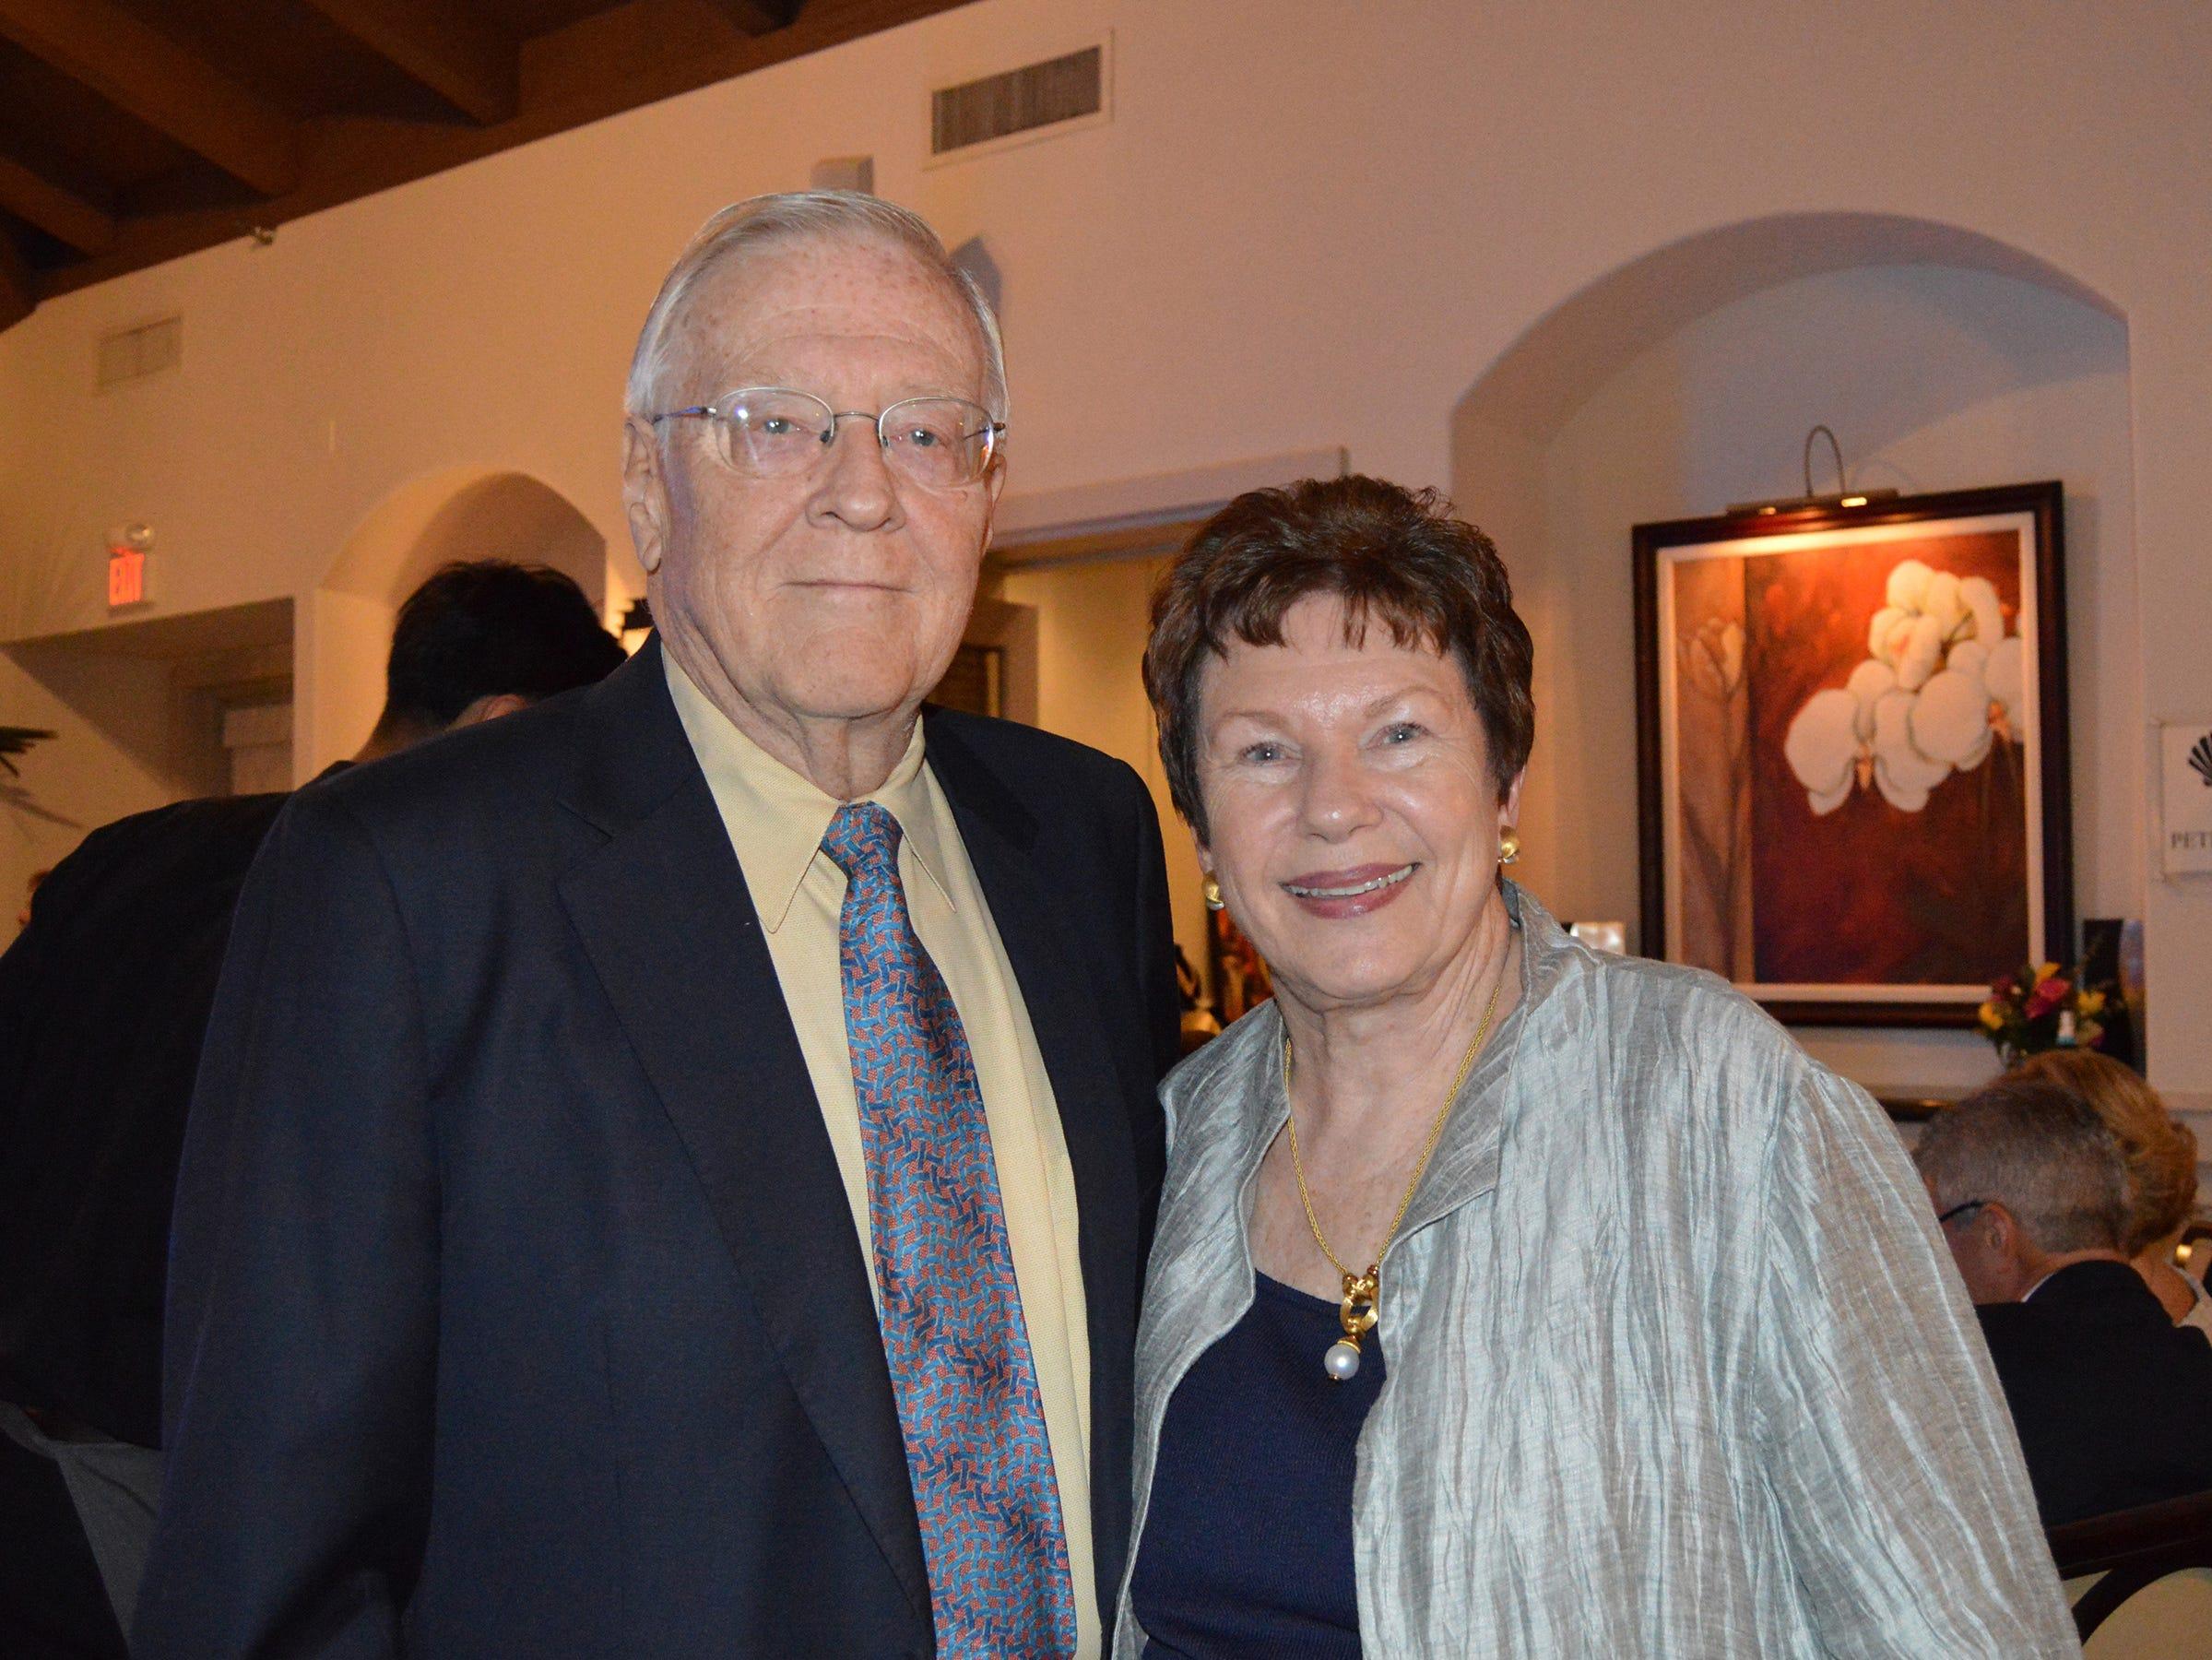 Mel and Linda Teetz  at the Diamonds in the Rough Gala at Grand Harbor Golf & Beach Club on Jan.24.